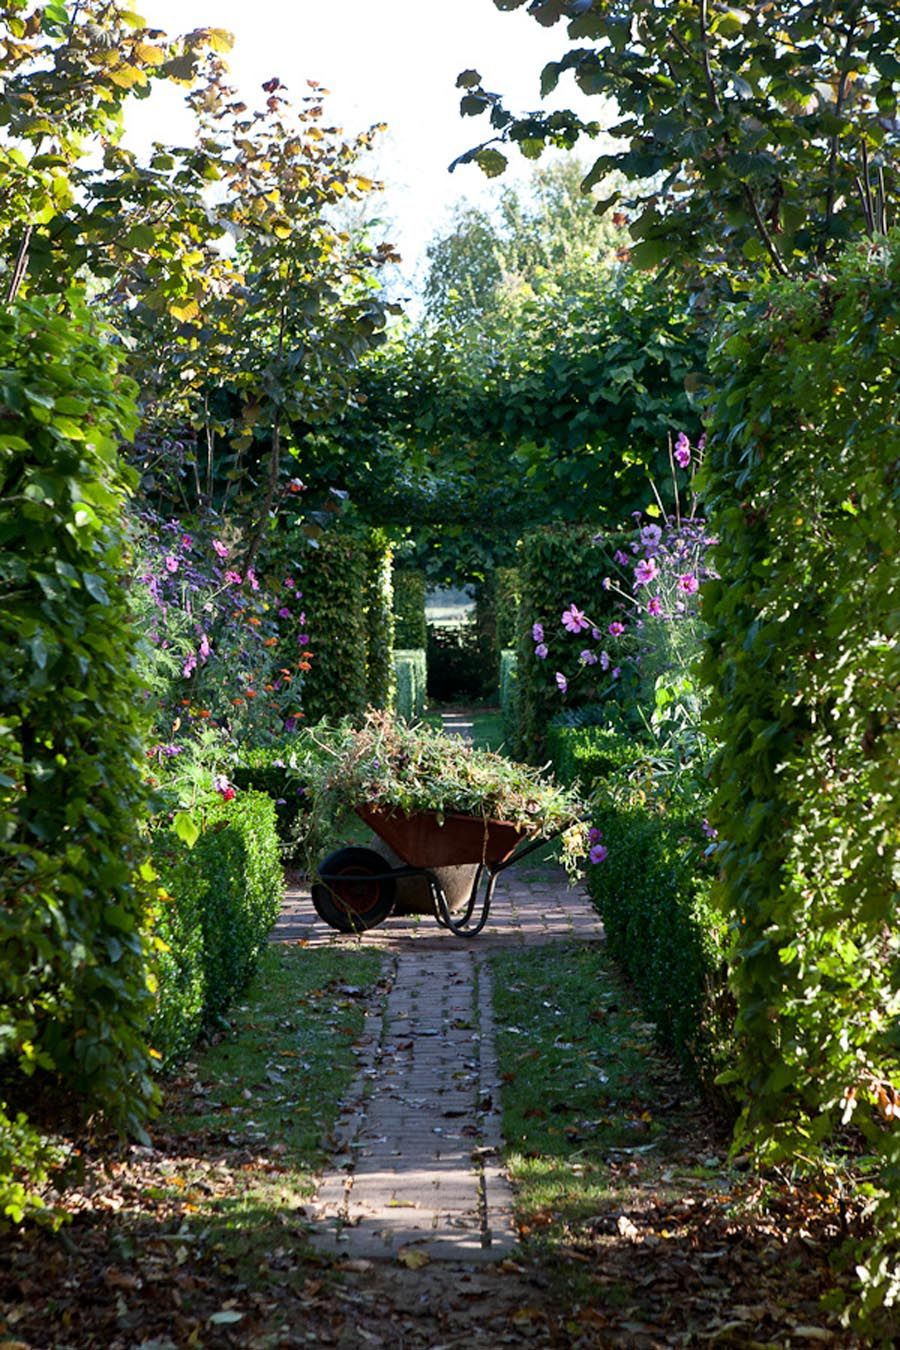 Cottage garden landscape design ideas  Pin by Rachel C on in the garden  Pinterest  Gardens Landscaping